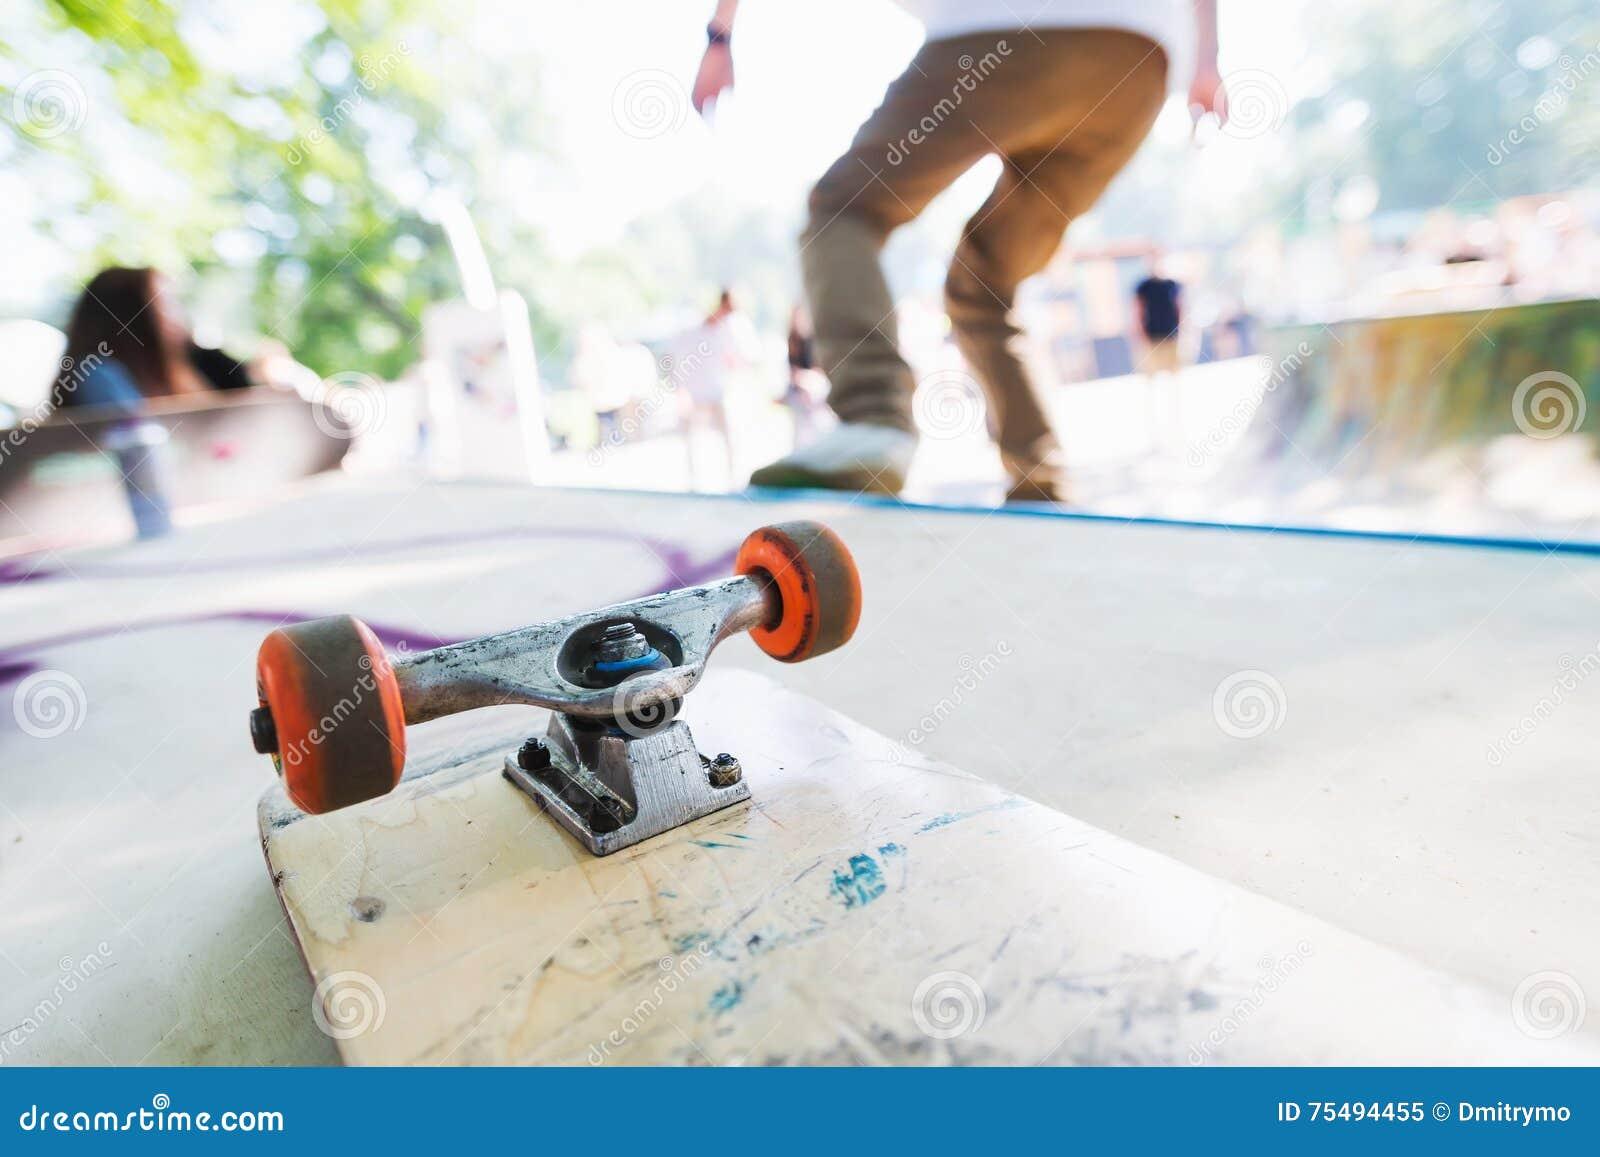 Blank skateboard on the ramp